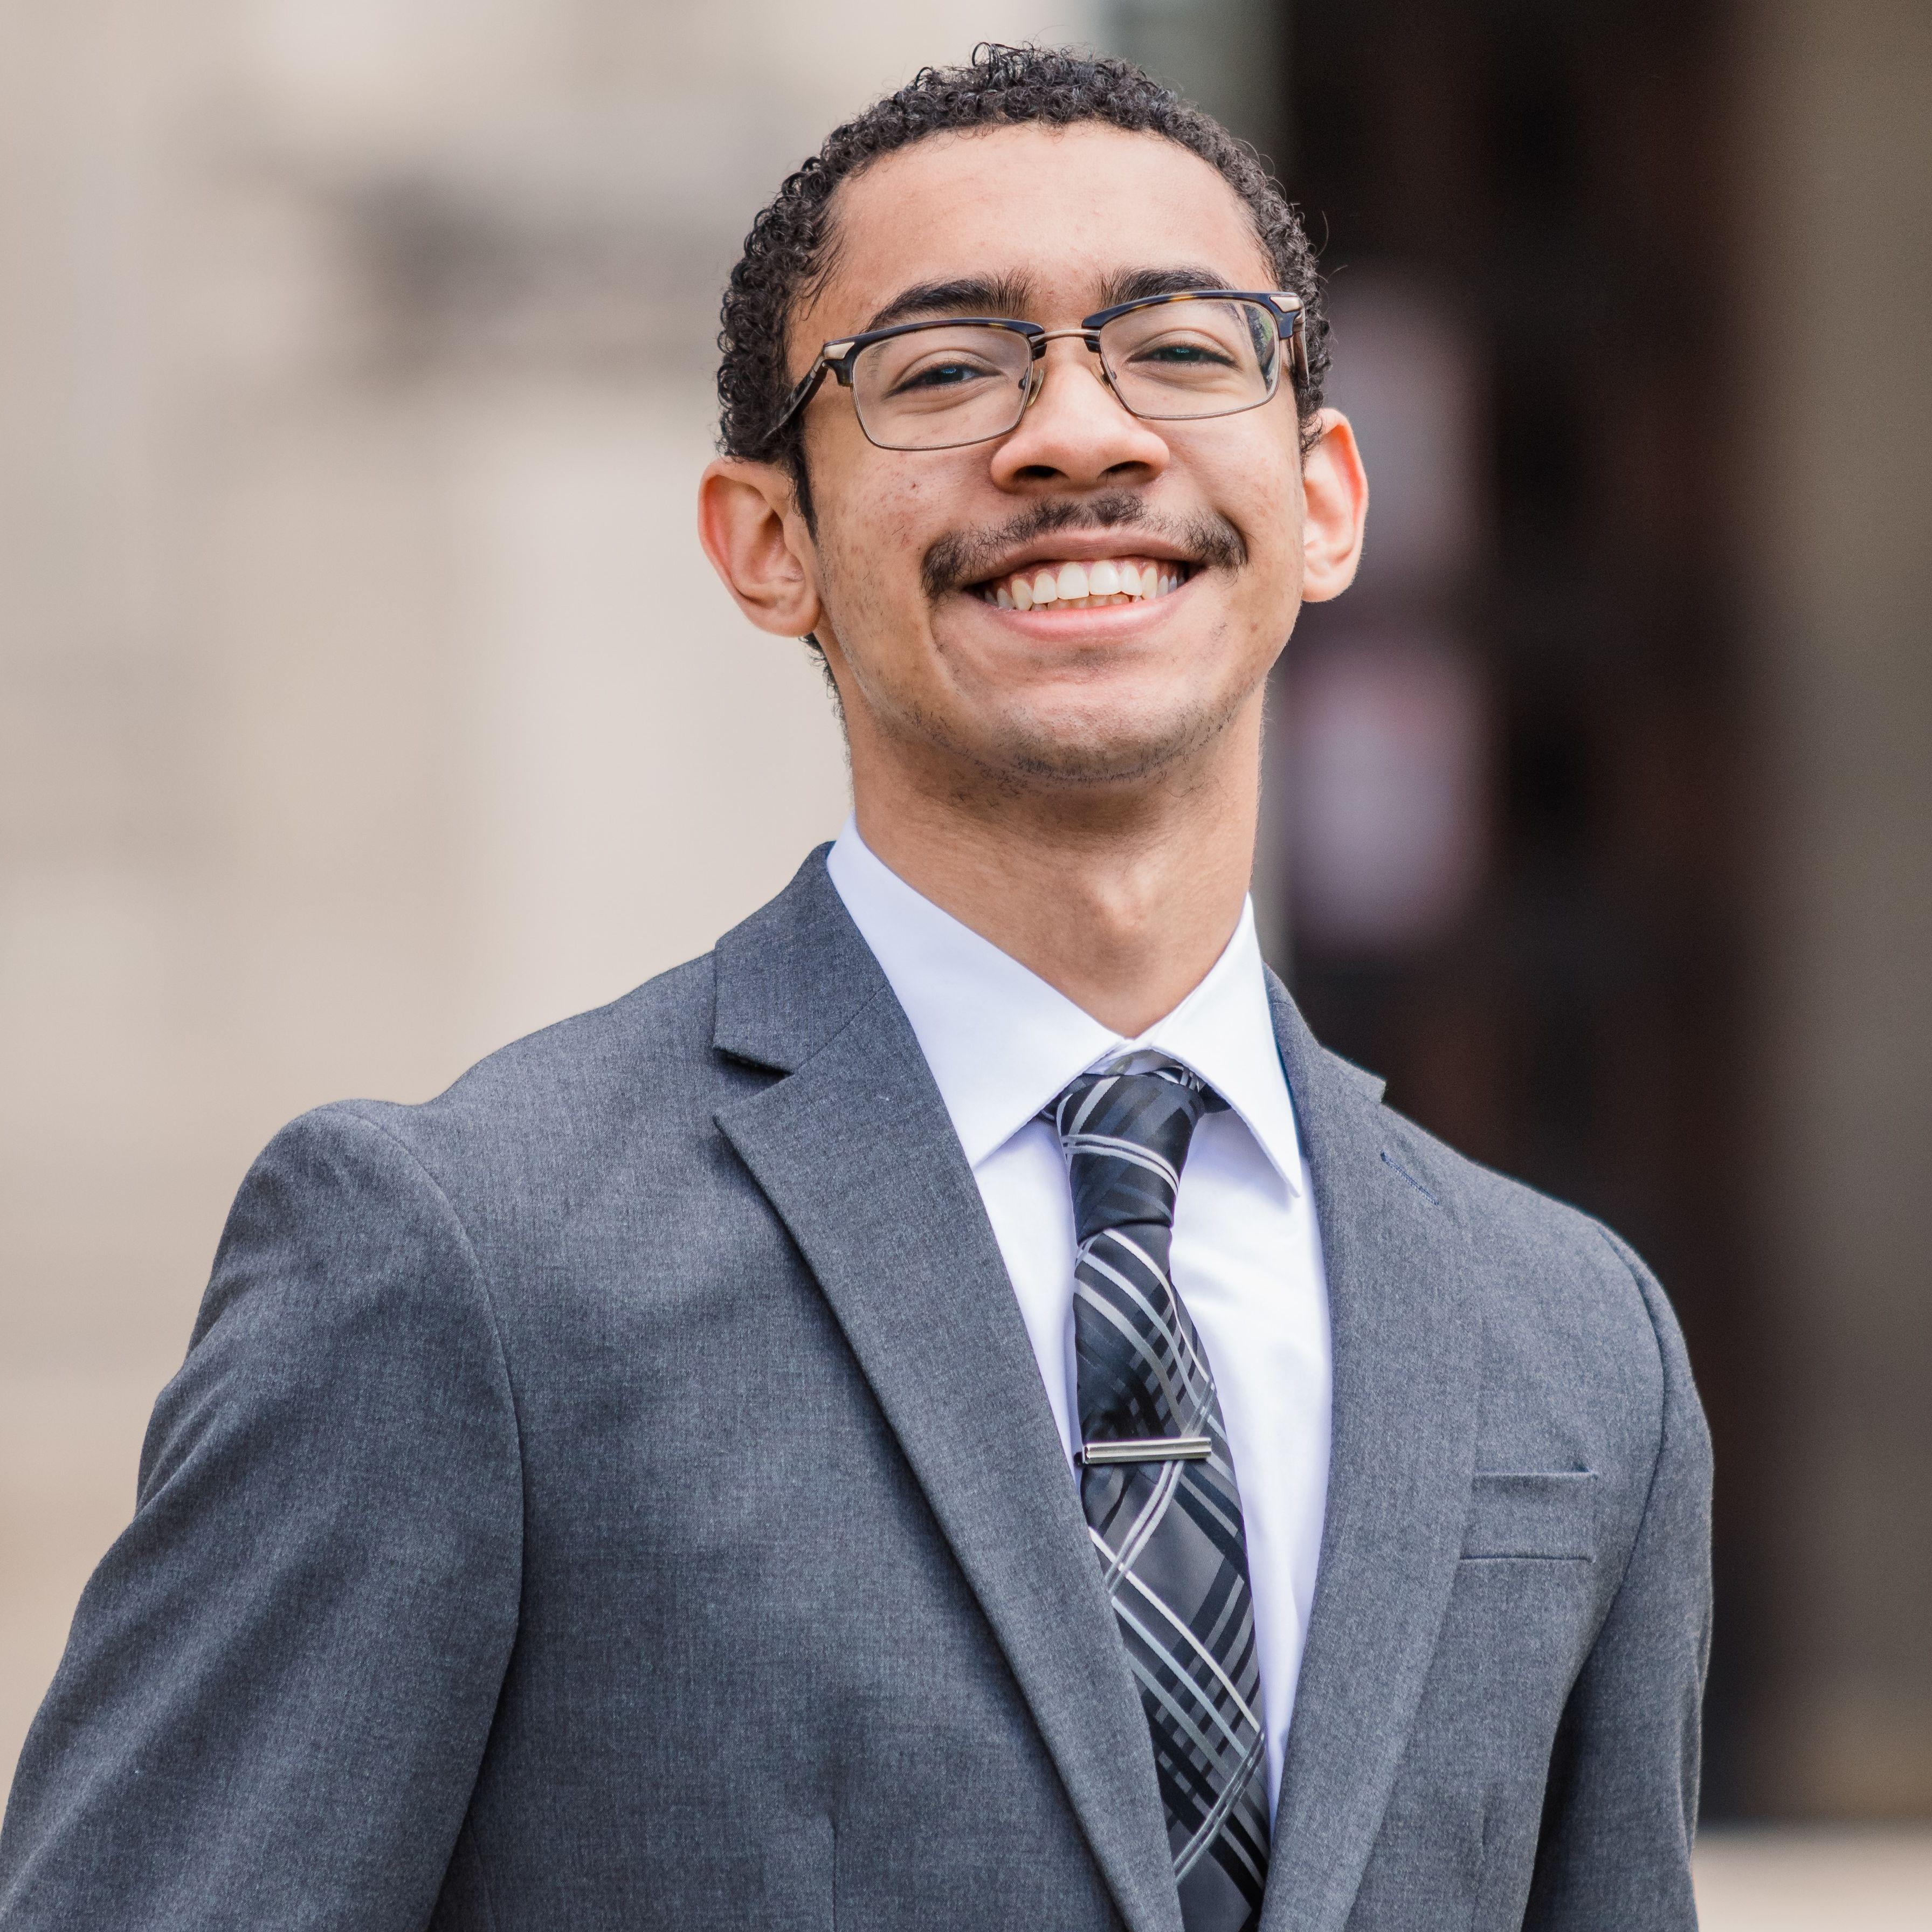 Christian Rodriguez from Northwestern University